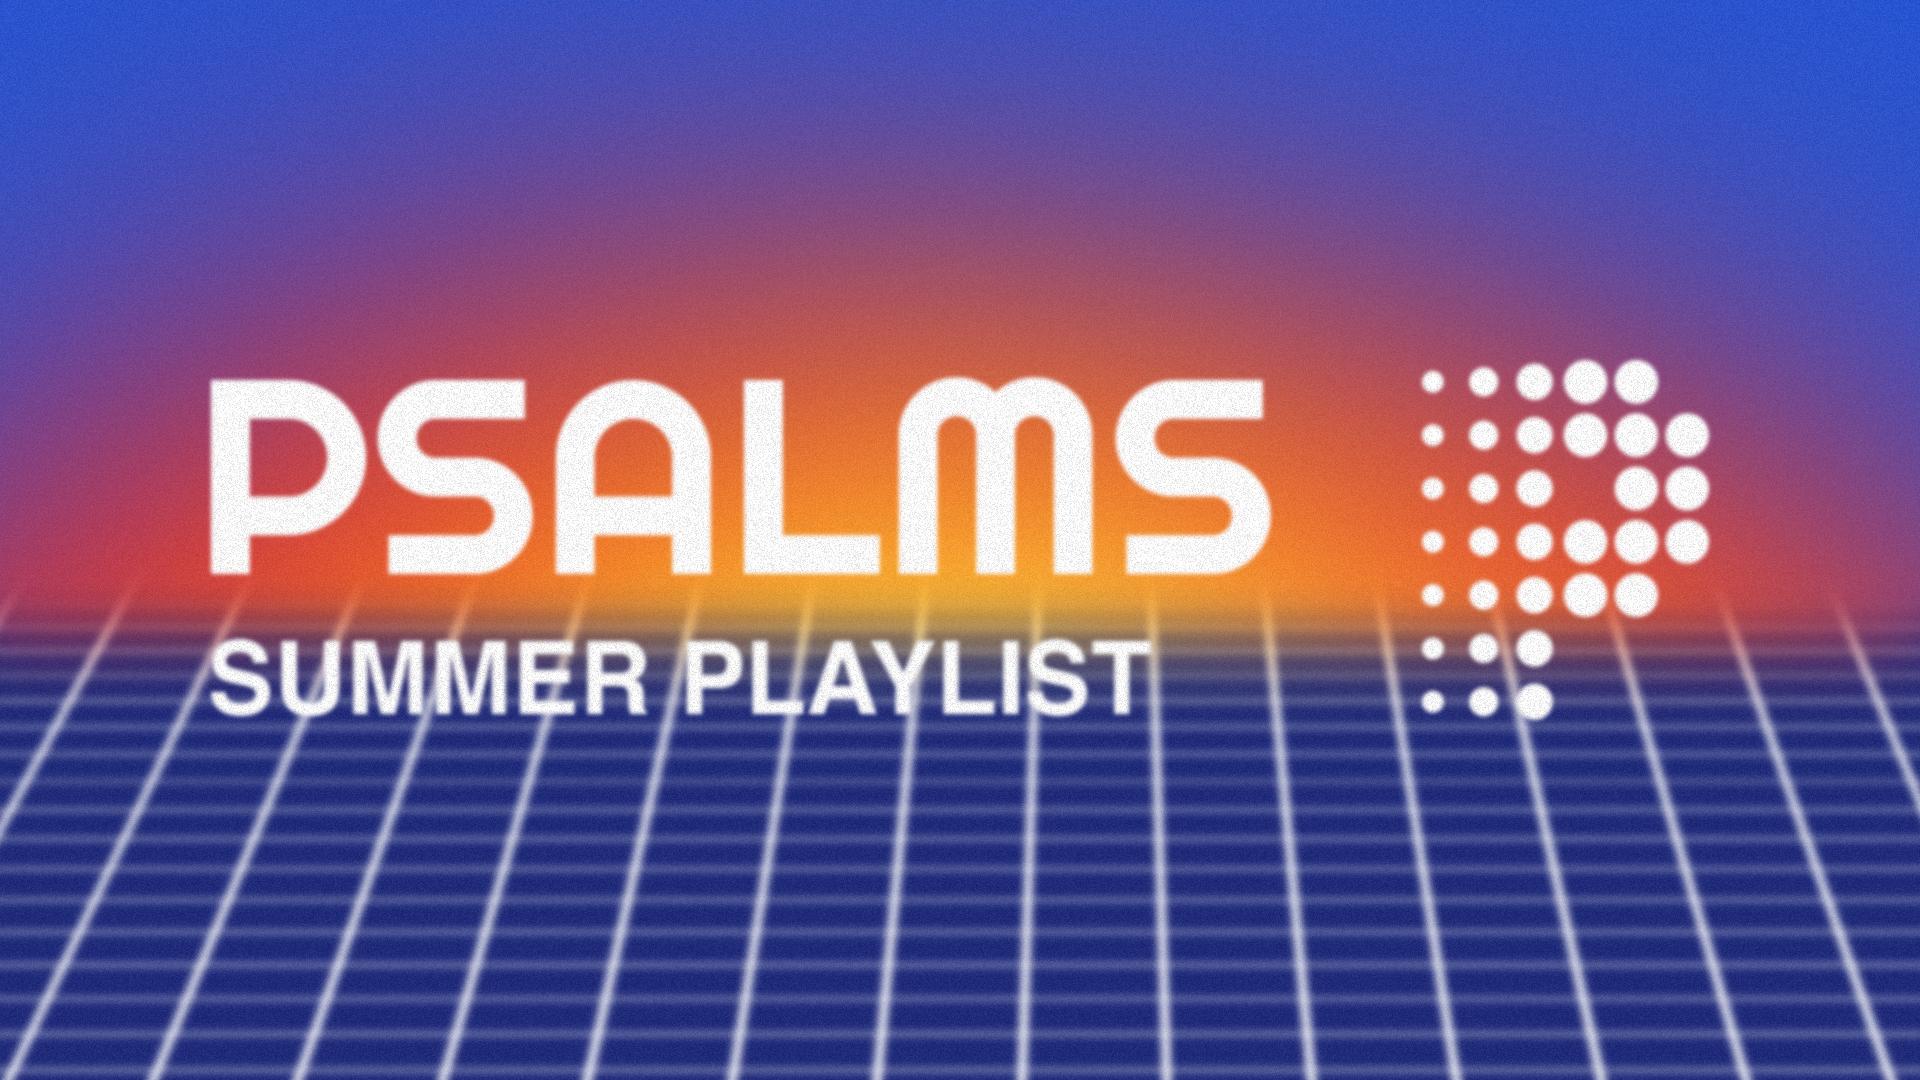 Psalms_SideScreens.jpg